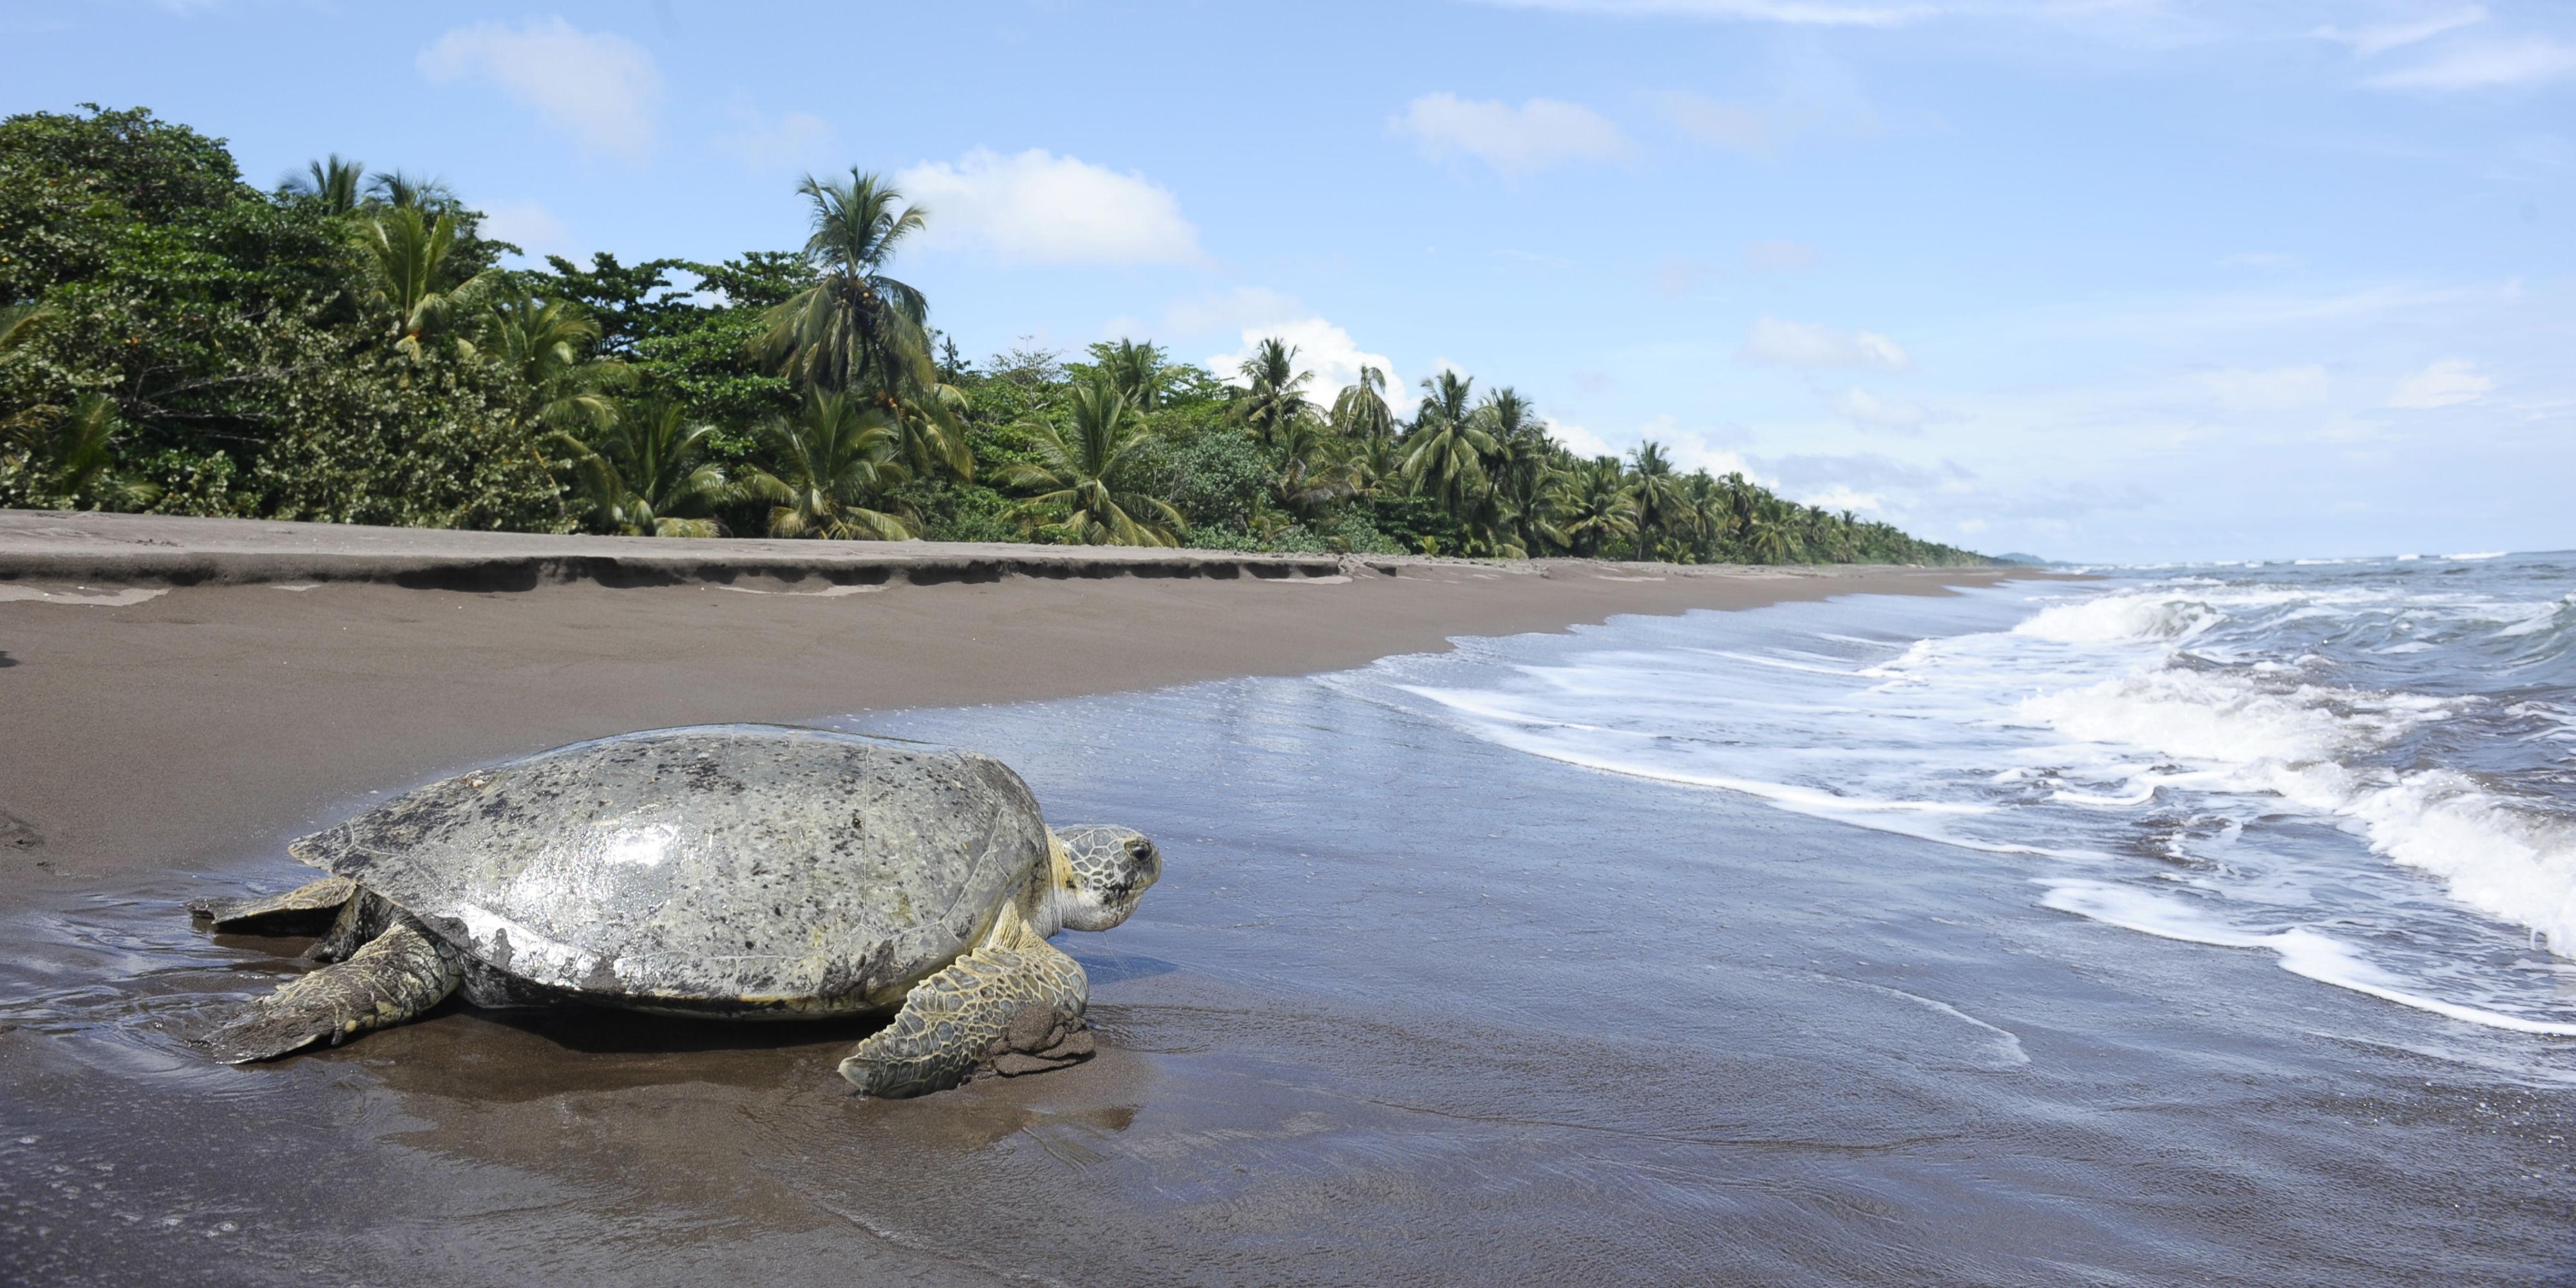 Costa Rica sea turtles are part of a unique predator-prey interaction with jaguars in Tortuguero National Park, Costa Rica.